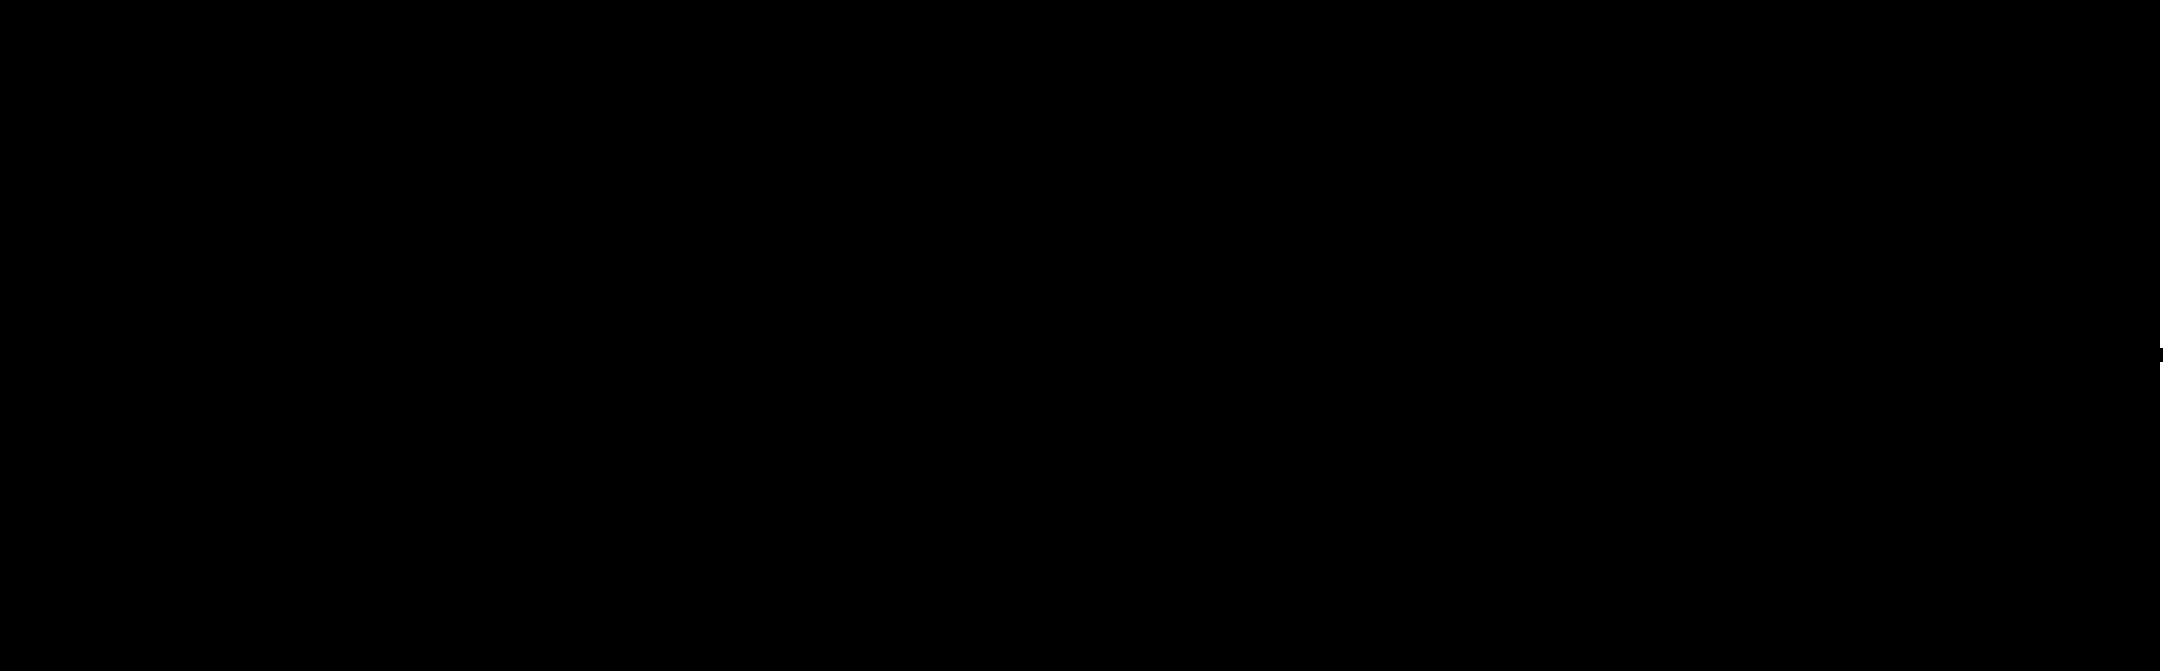 l'angle mort logo black